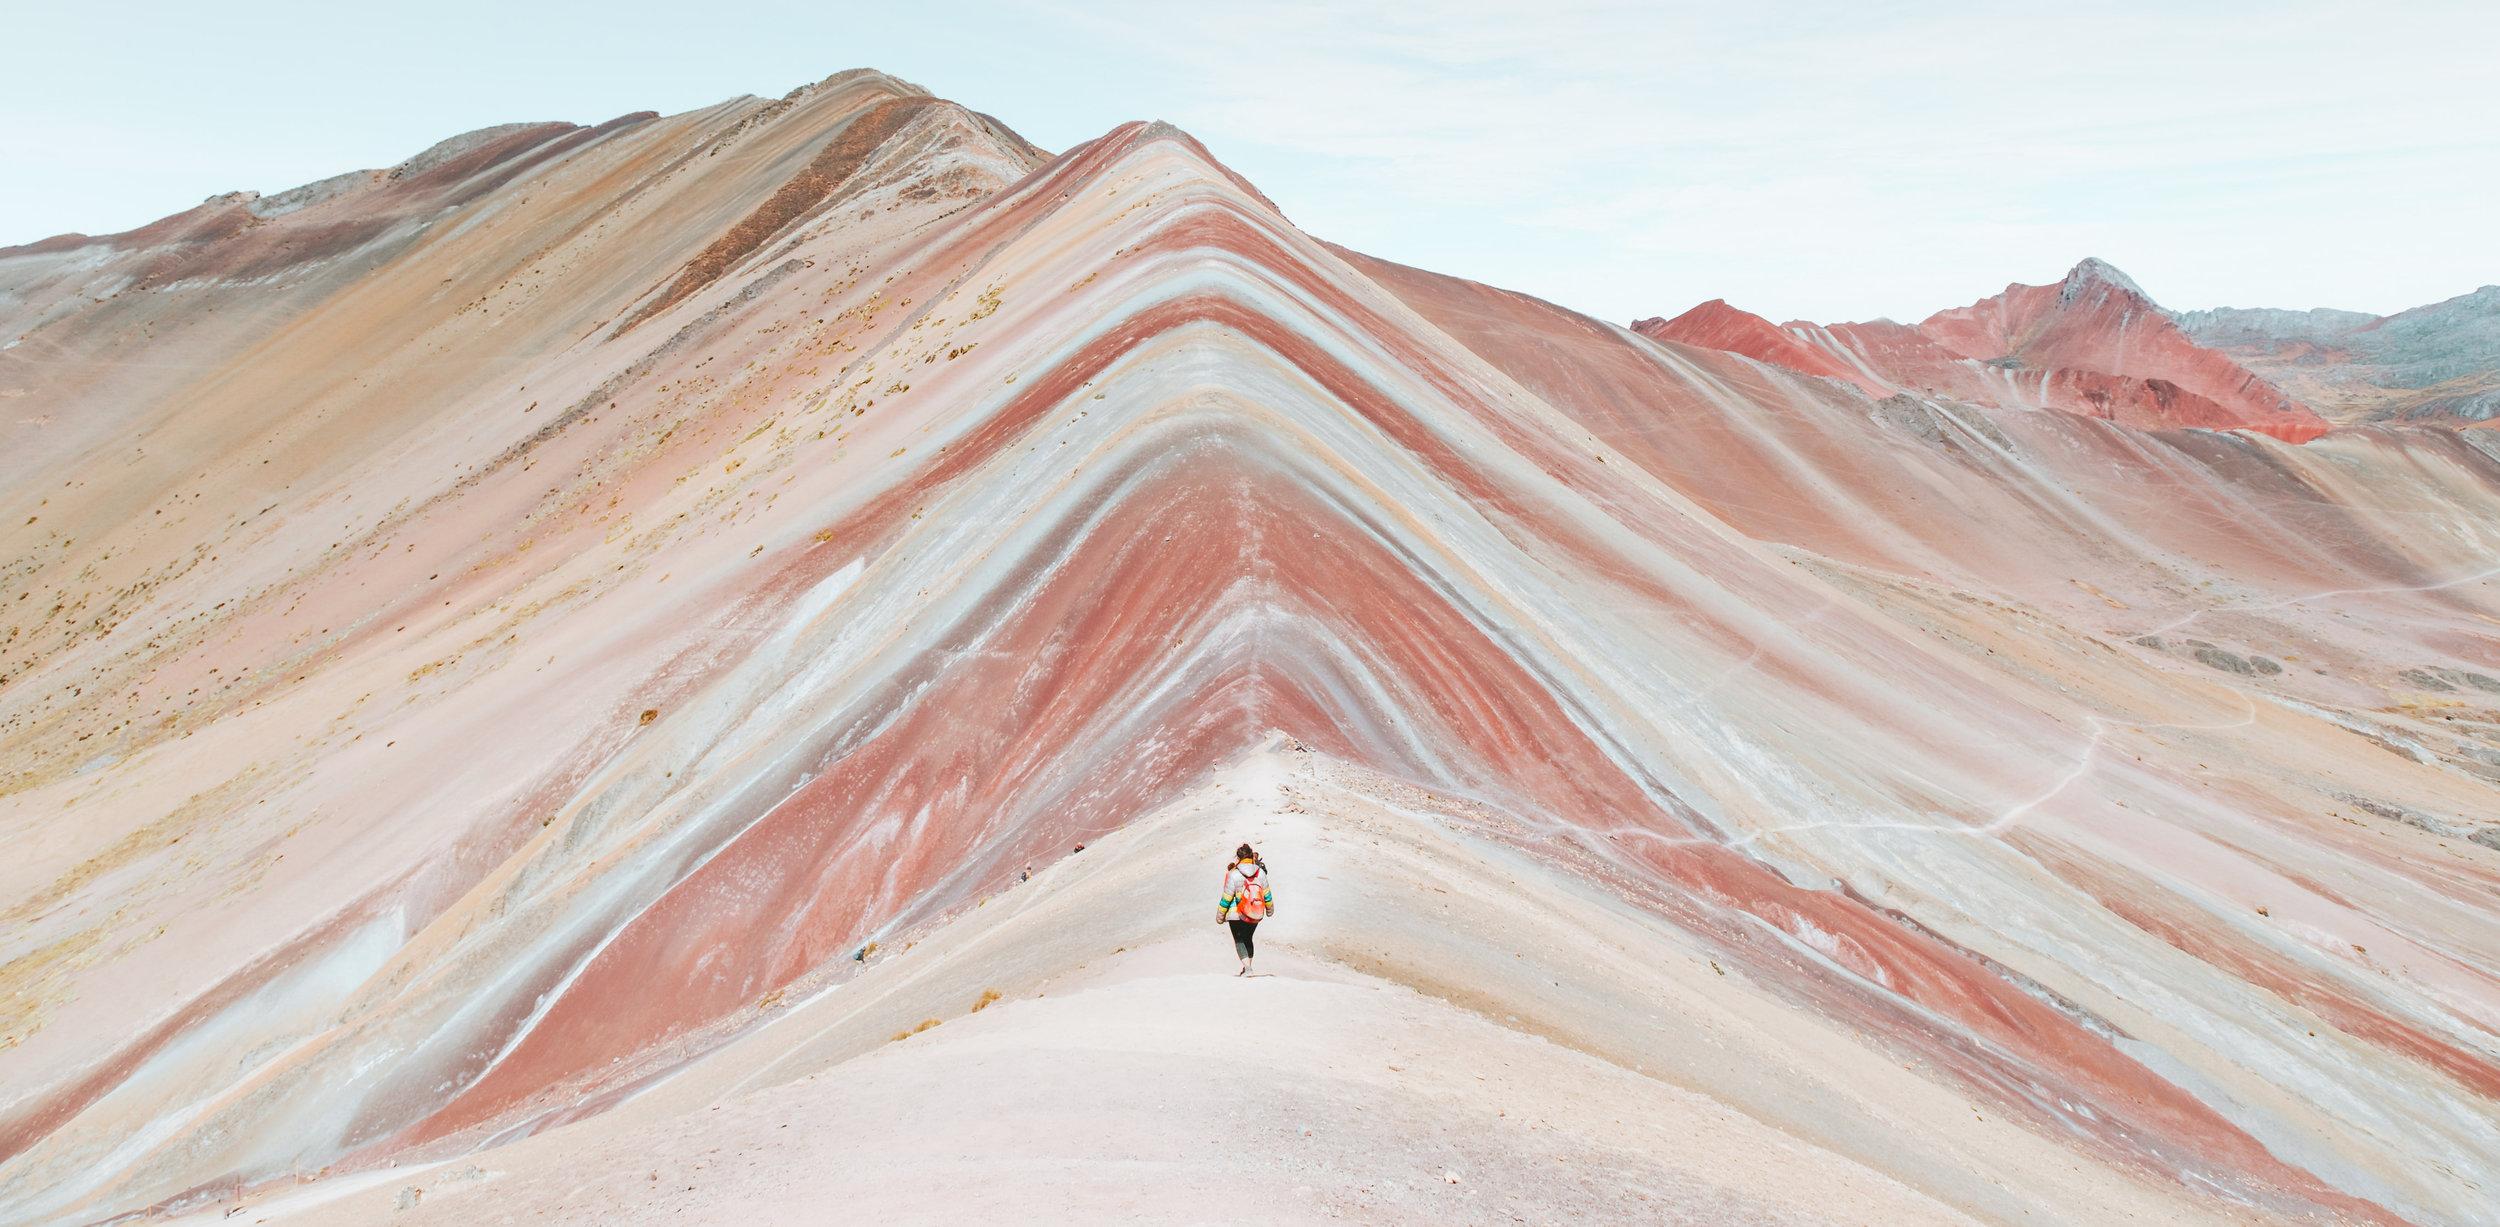 RainbowMountain_Peru.JPG